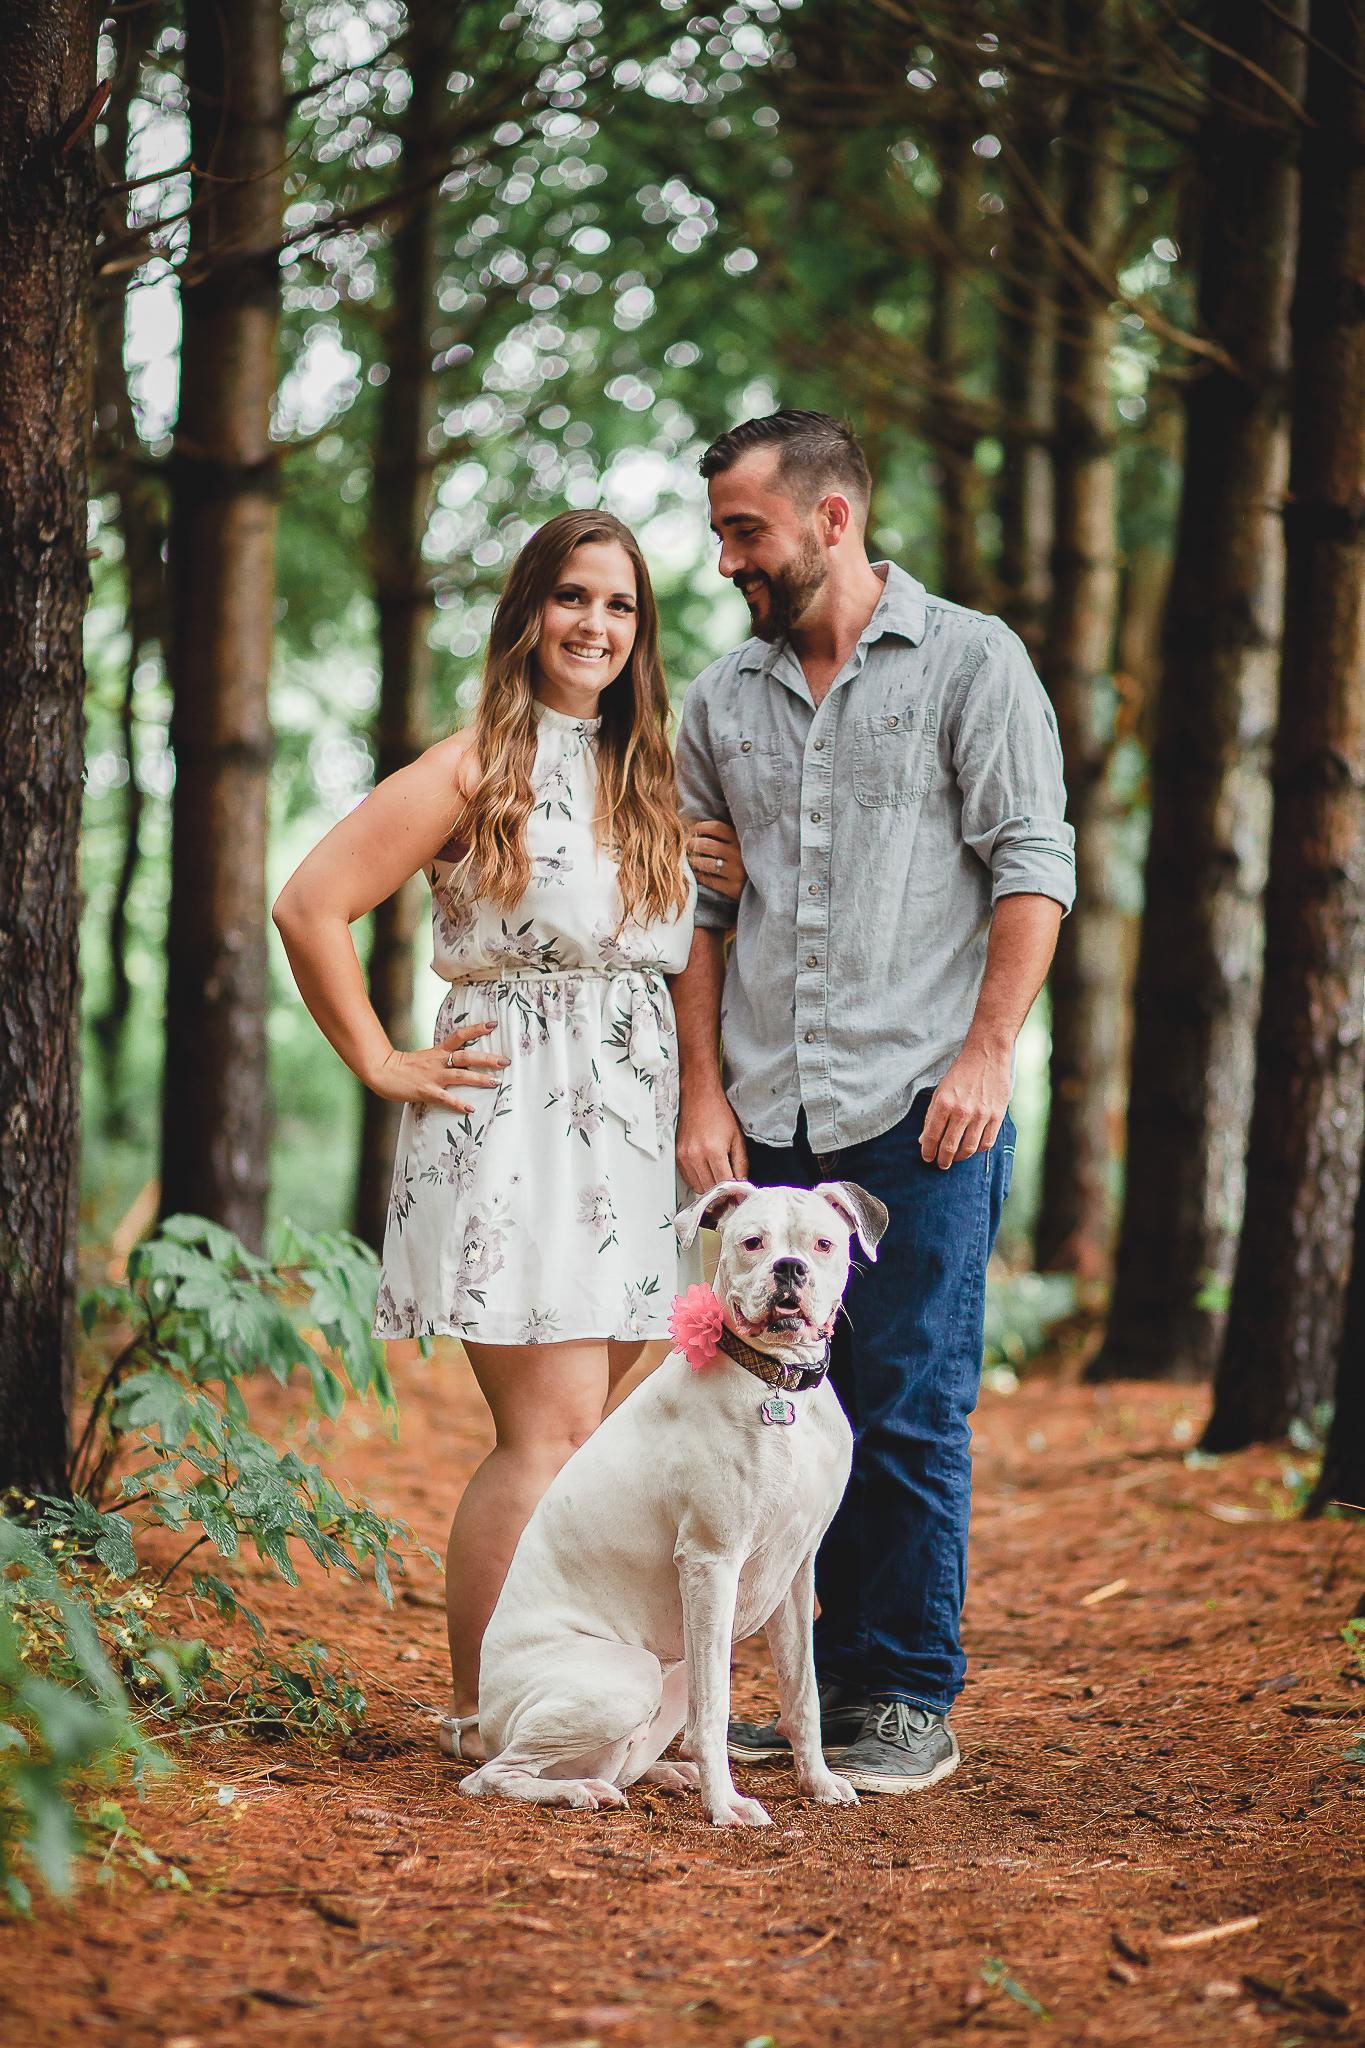 Amy D Photography- Barrie Wedding Photography- Barrie Wedding Photography- Engagement Session- Engagement Photography- Engagement Session Ideas- Wedding Photography.jpg